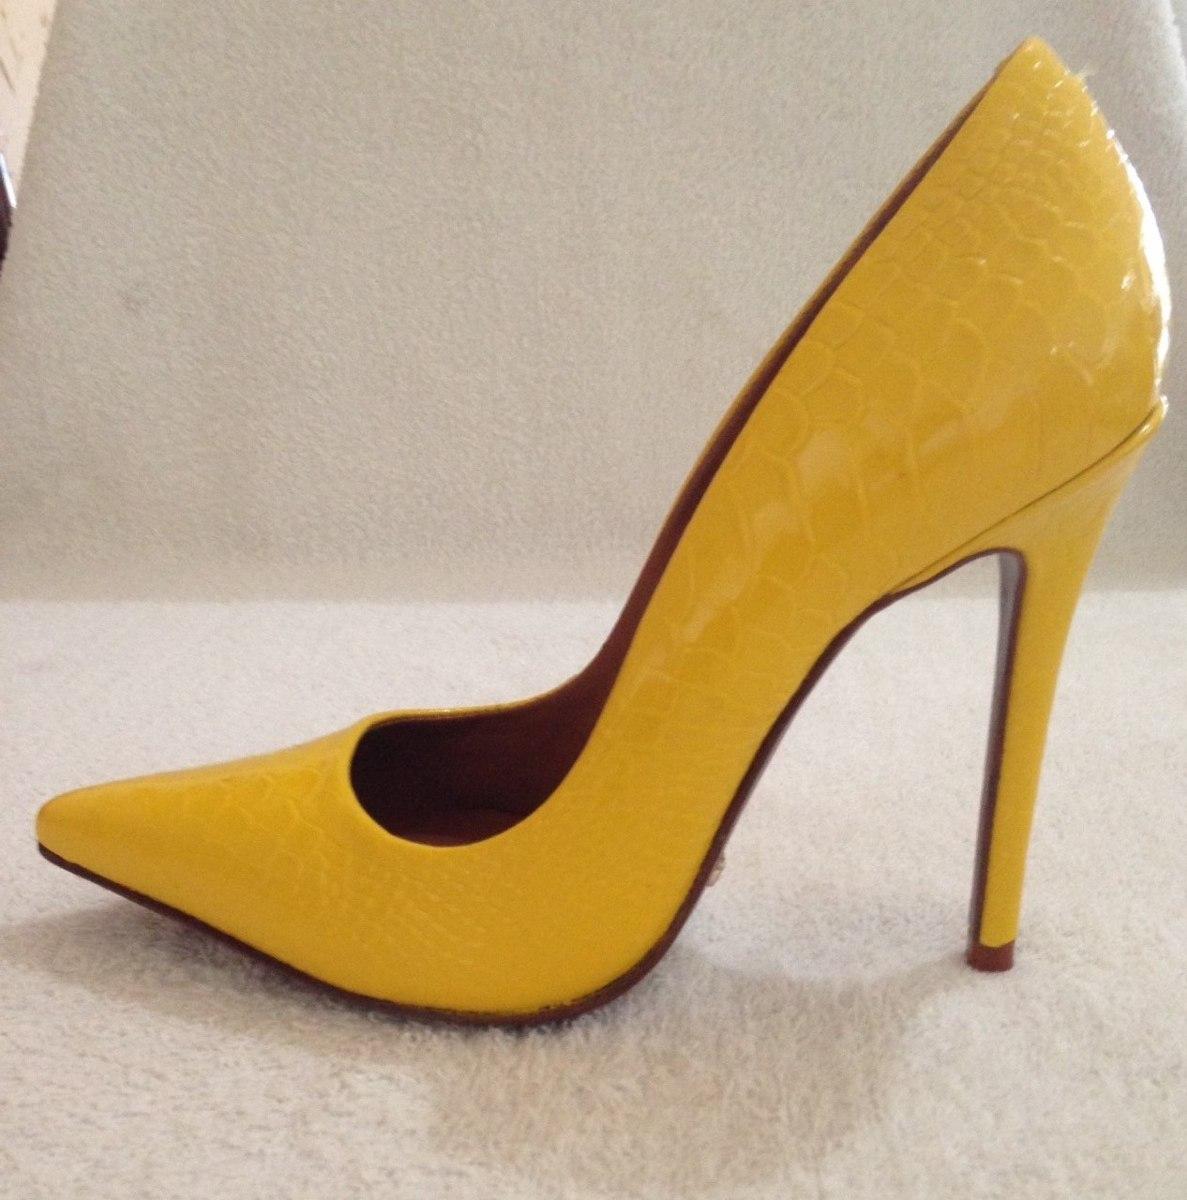 d4d2f6b127 Sapato Feminino Scarpin Amarelo - Marca Schutz - Novo!! - R  180